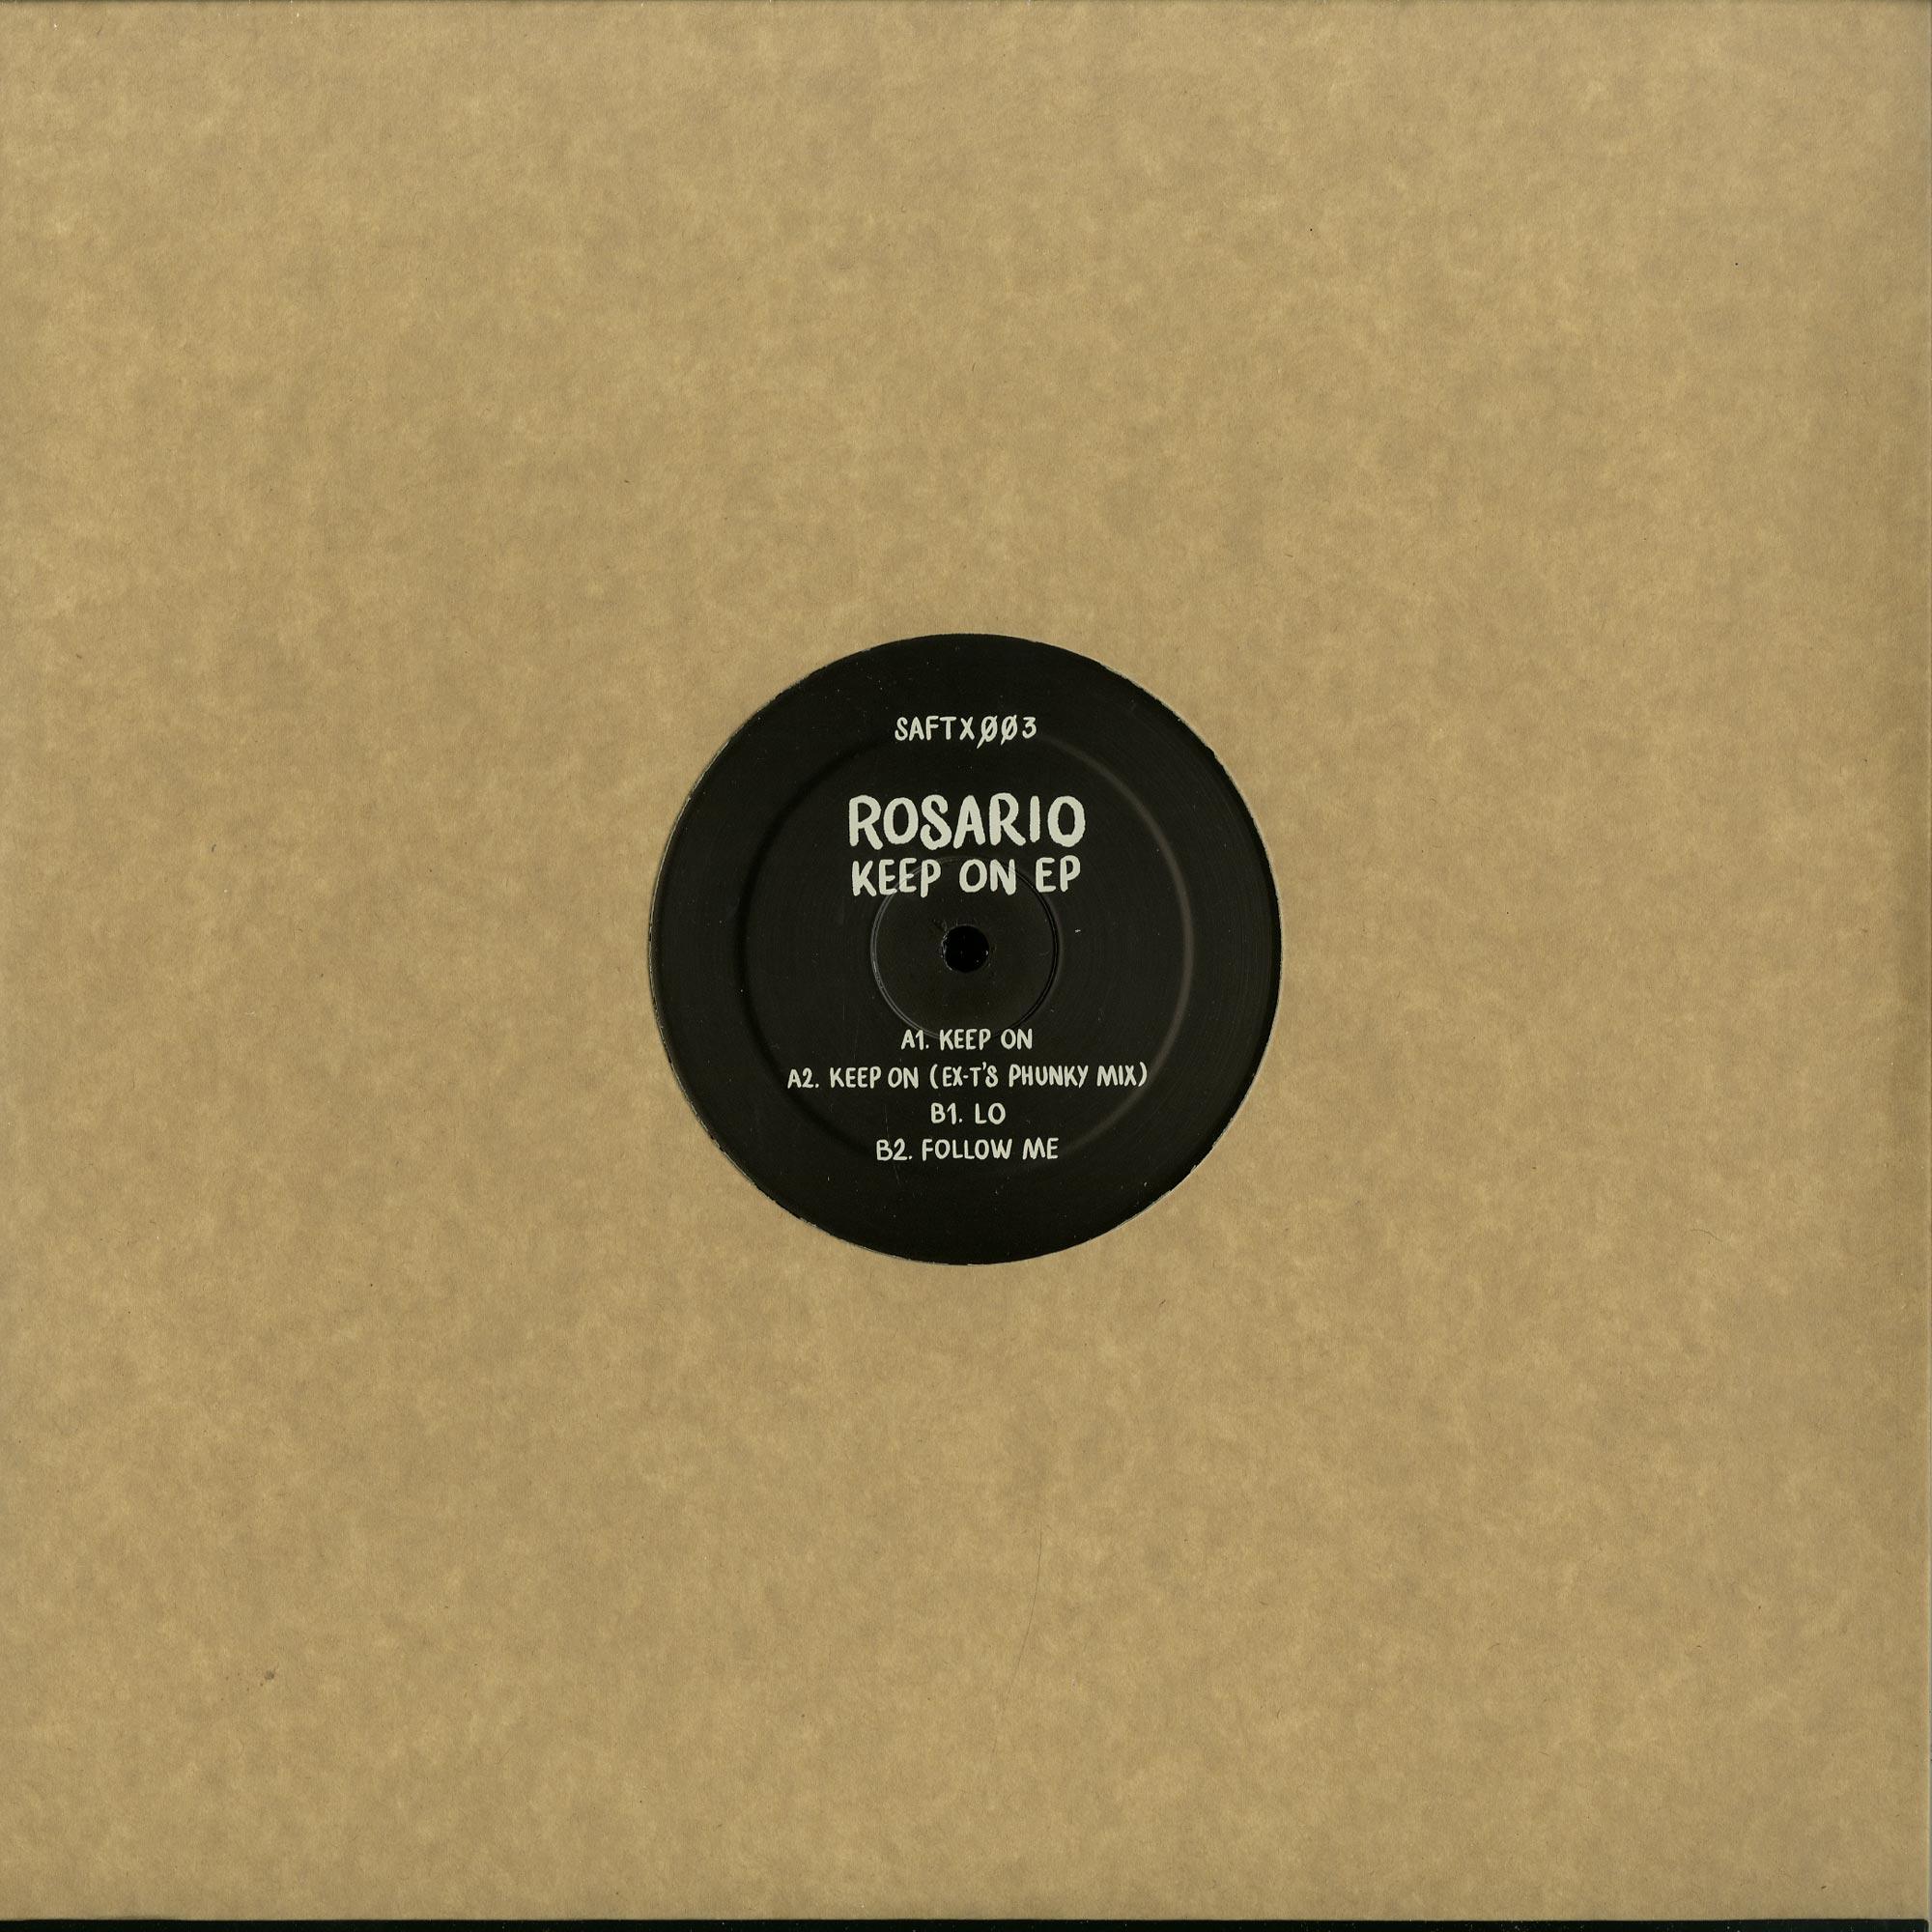 Rosario - KEEP ON EP